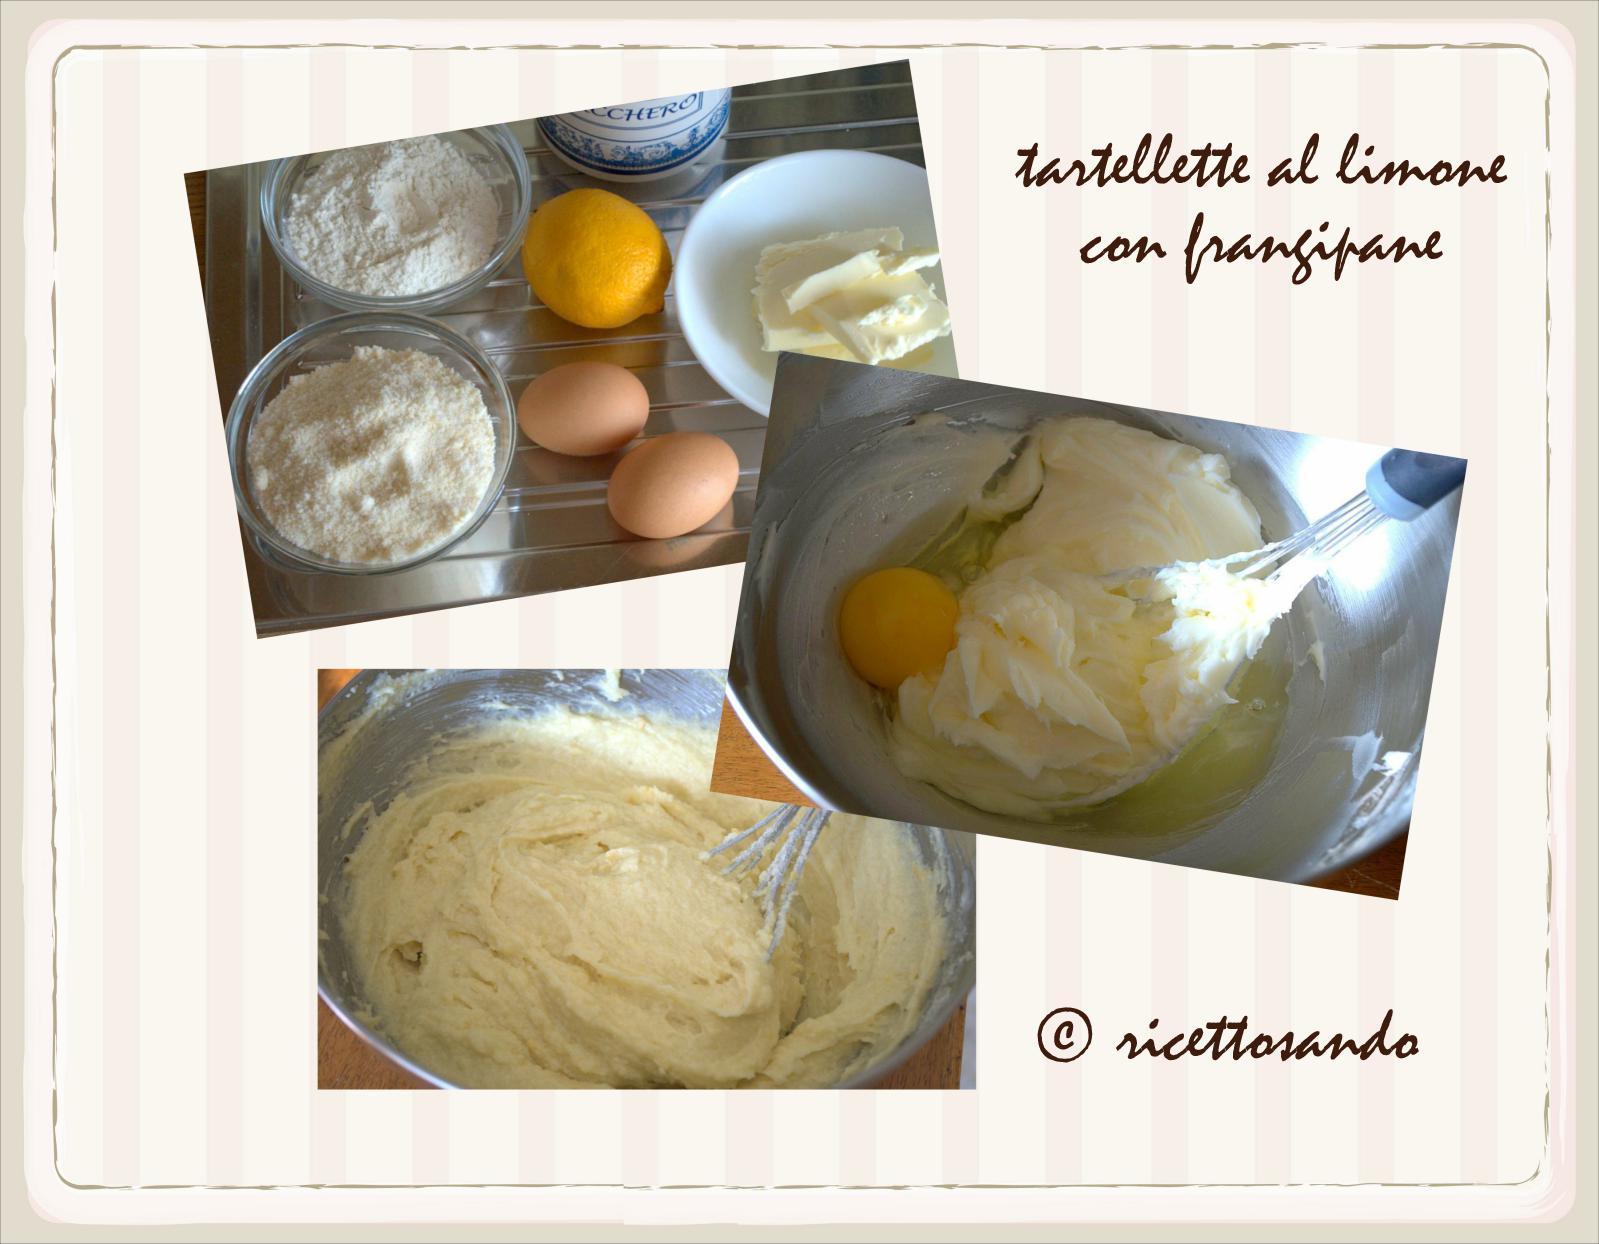 Crostatine al limone e frangipane ricetta dolce prepariamo la crema frangipane